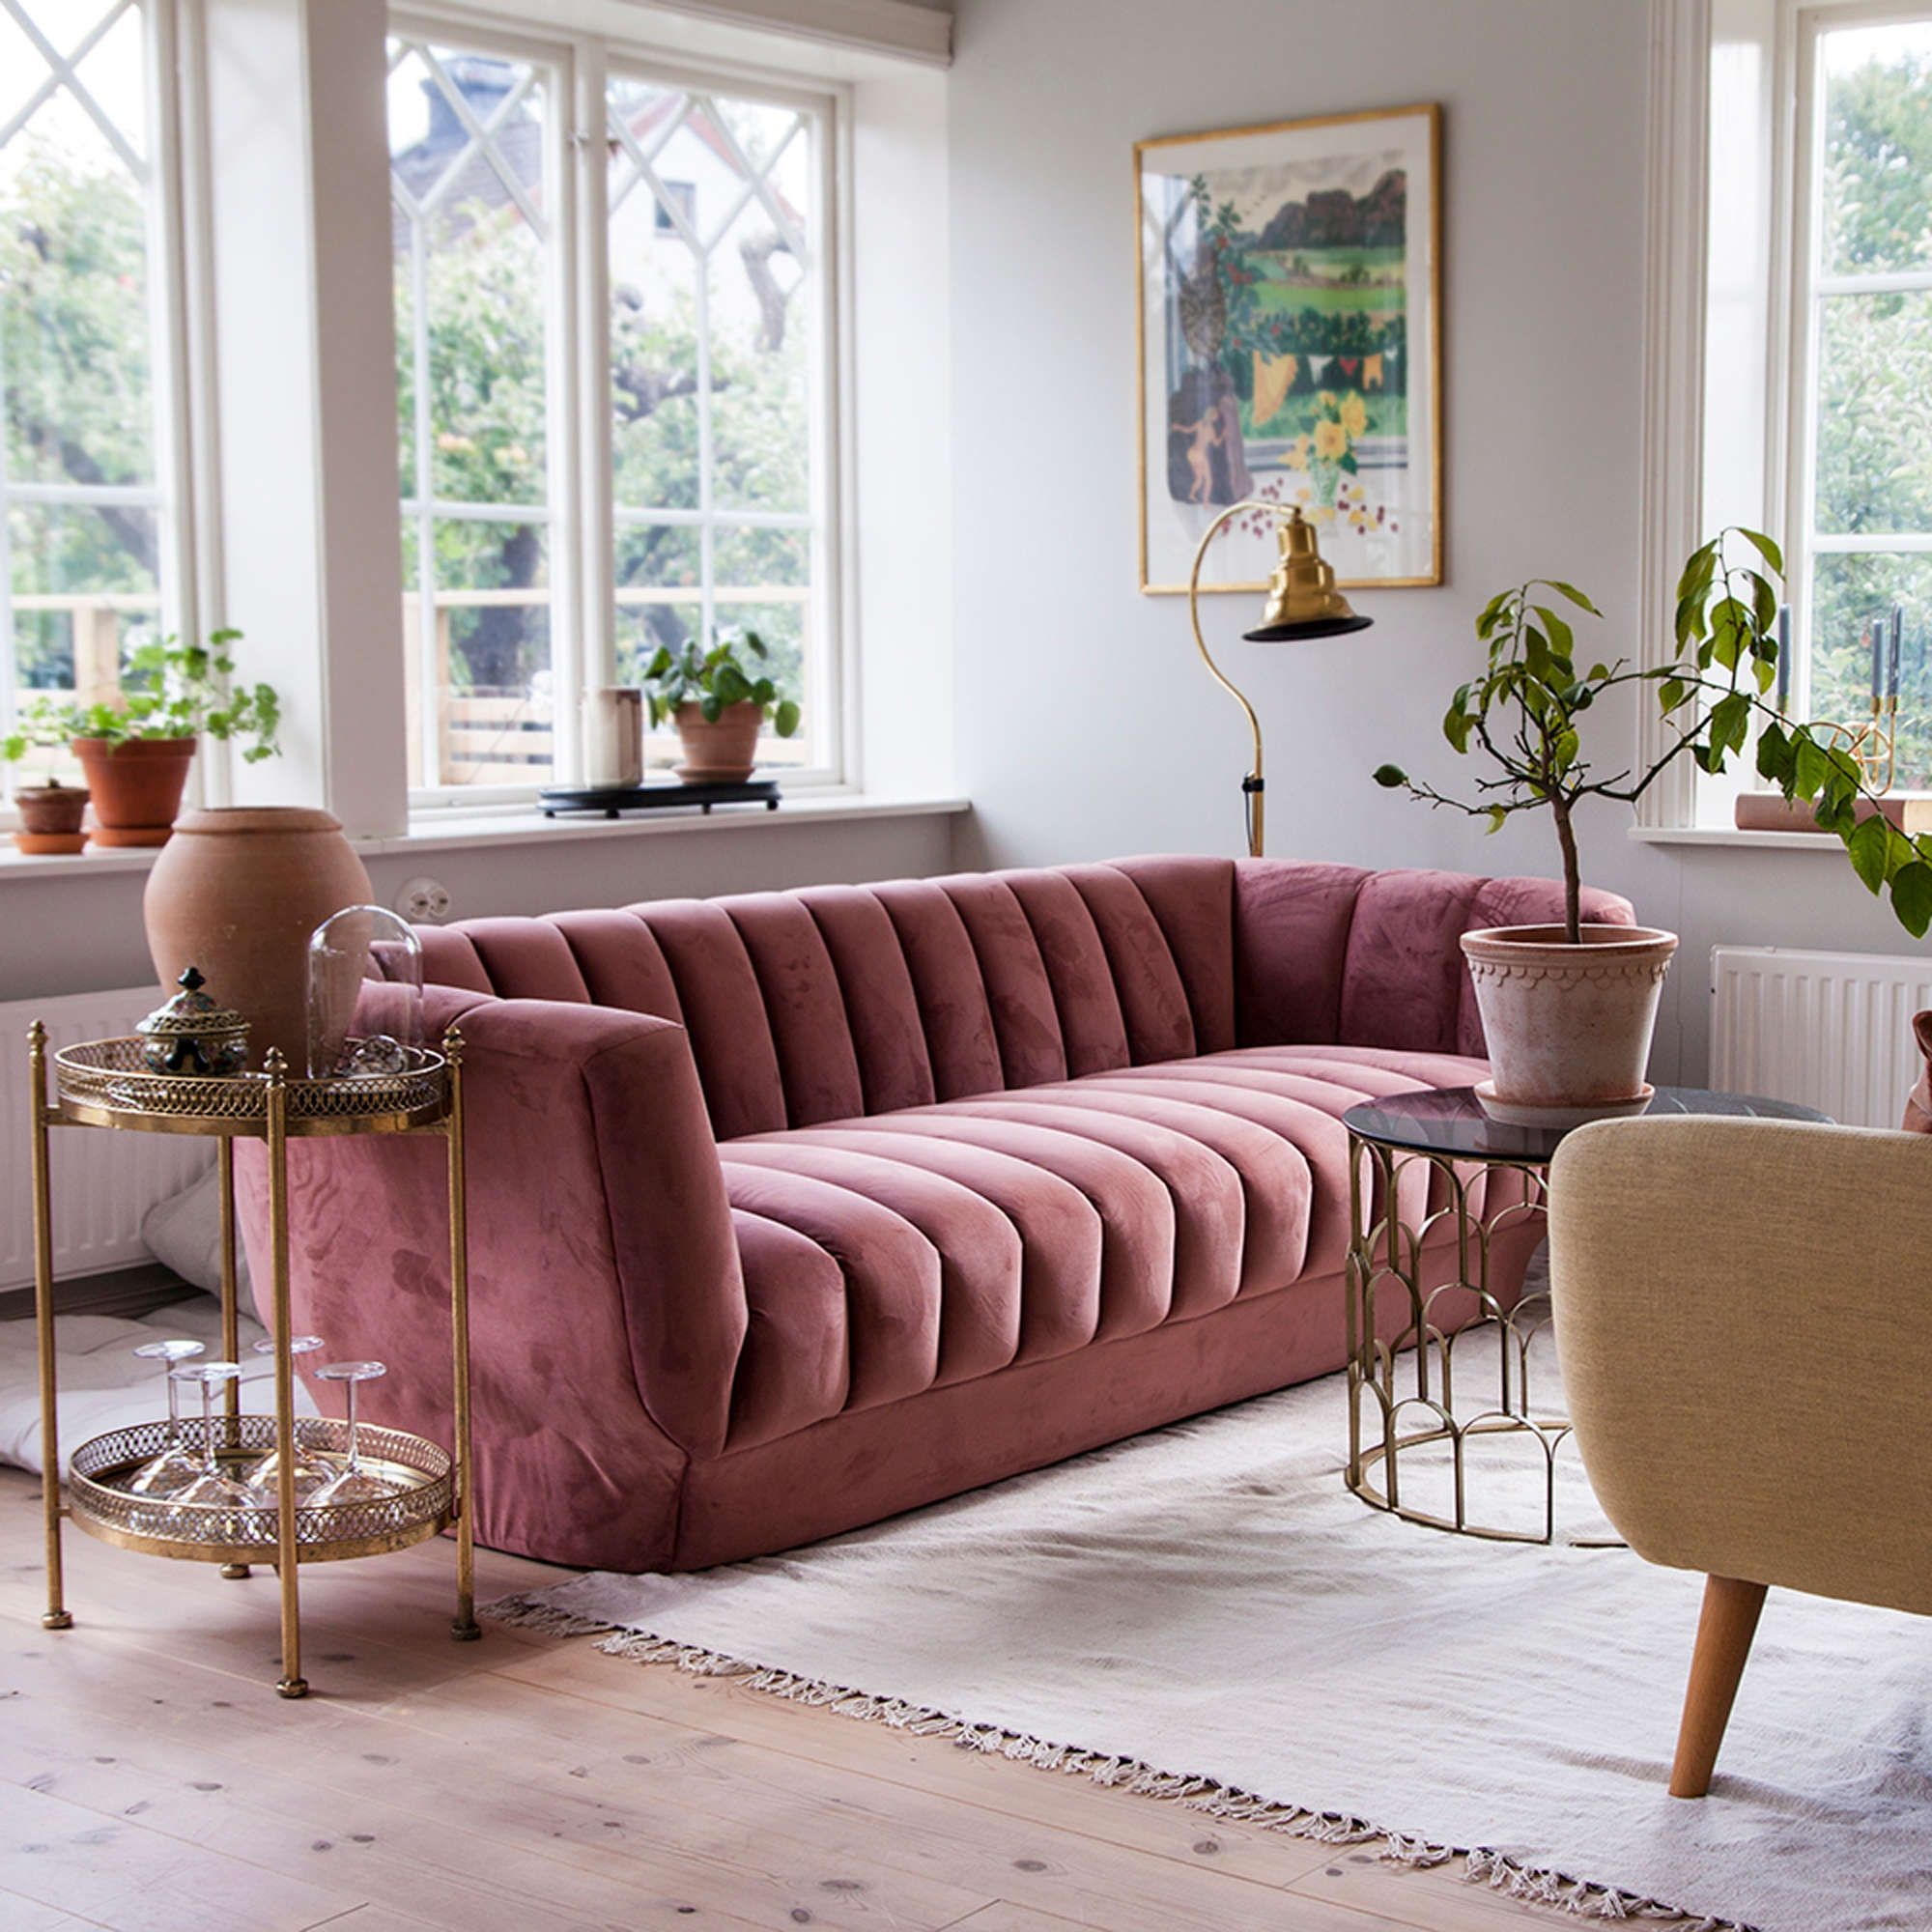 This Swedish House Is an Art Deco Scandi Dream Home   Art ...